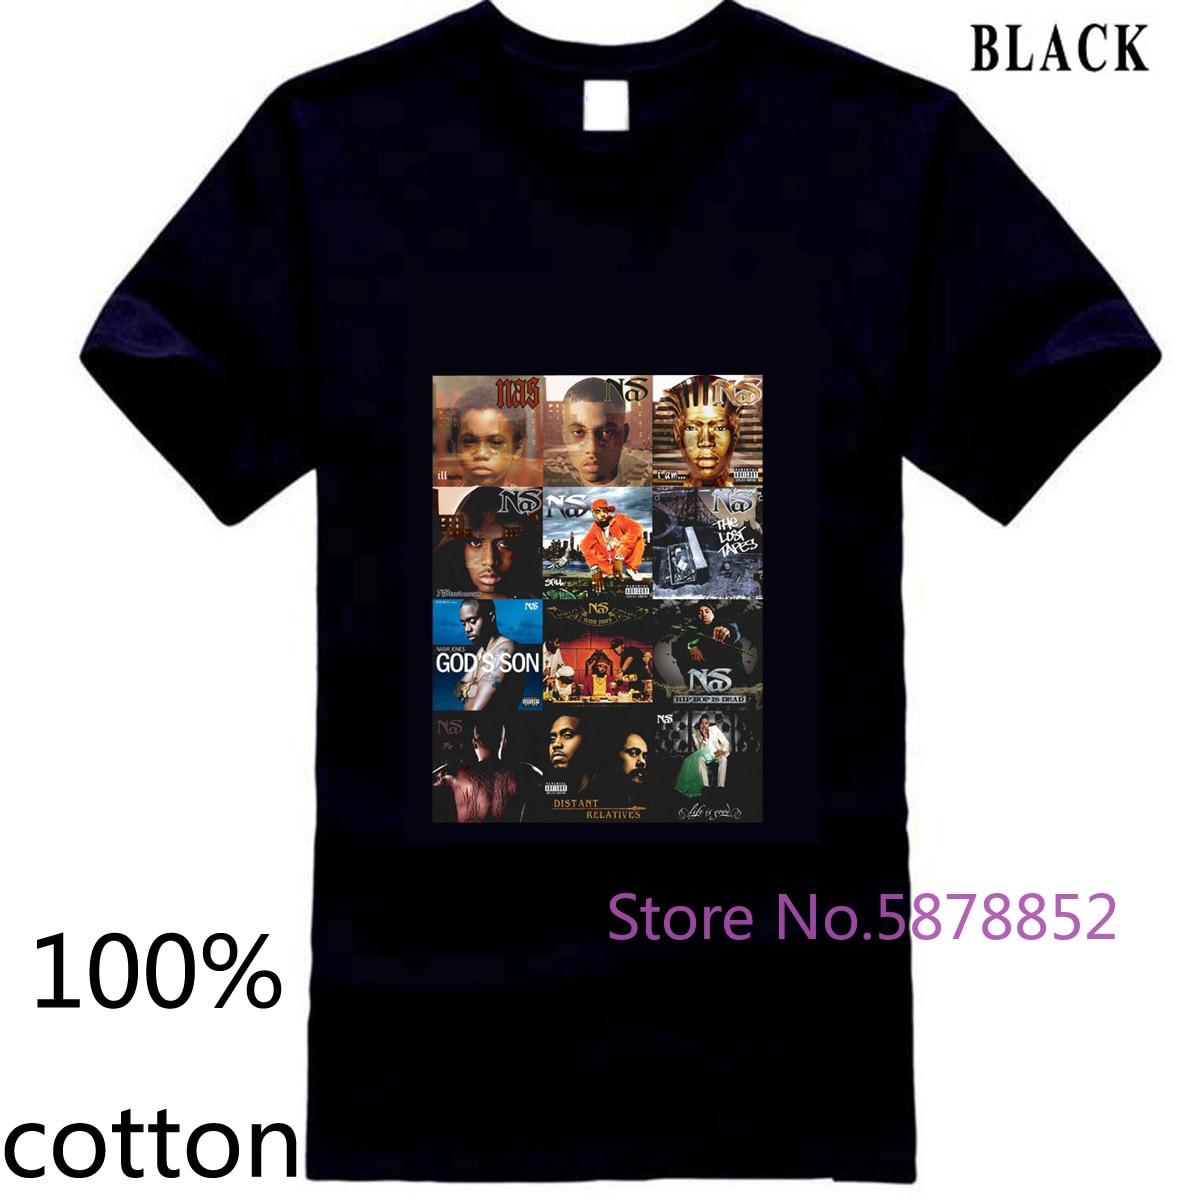 Cubiertas de álbum NAS DJ KHALED ILLMATIC FESTIVAL TRAP HIP HOP RAP PAC NY camiseta para hombre Camiseta tops camisetas 100% de algodón para hombre